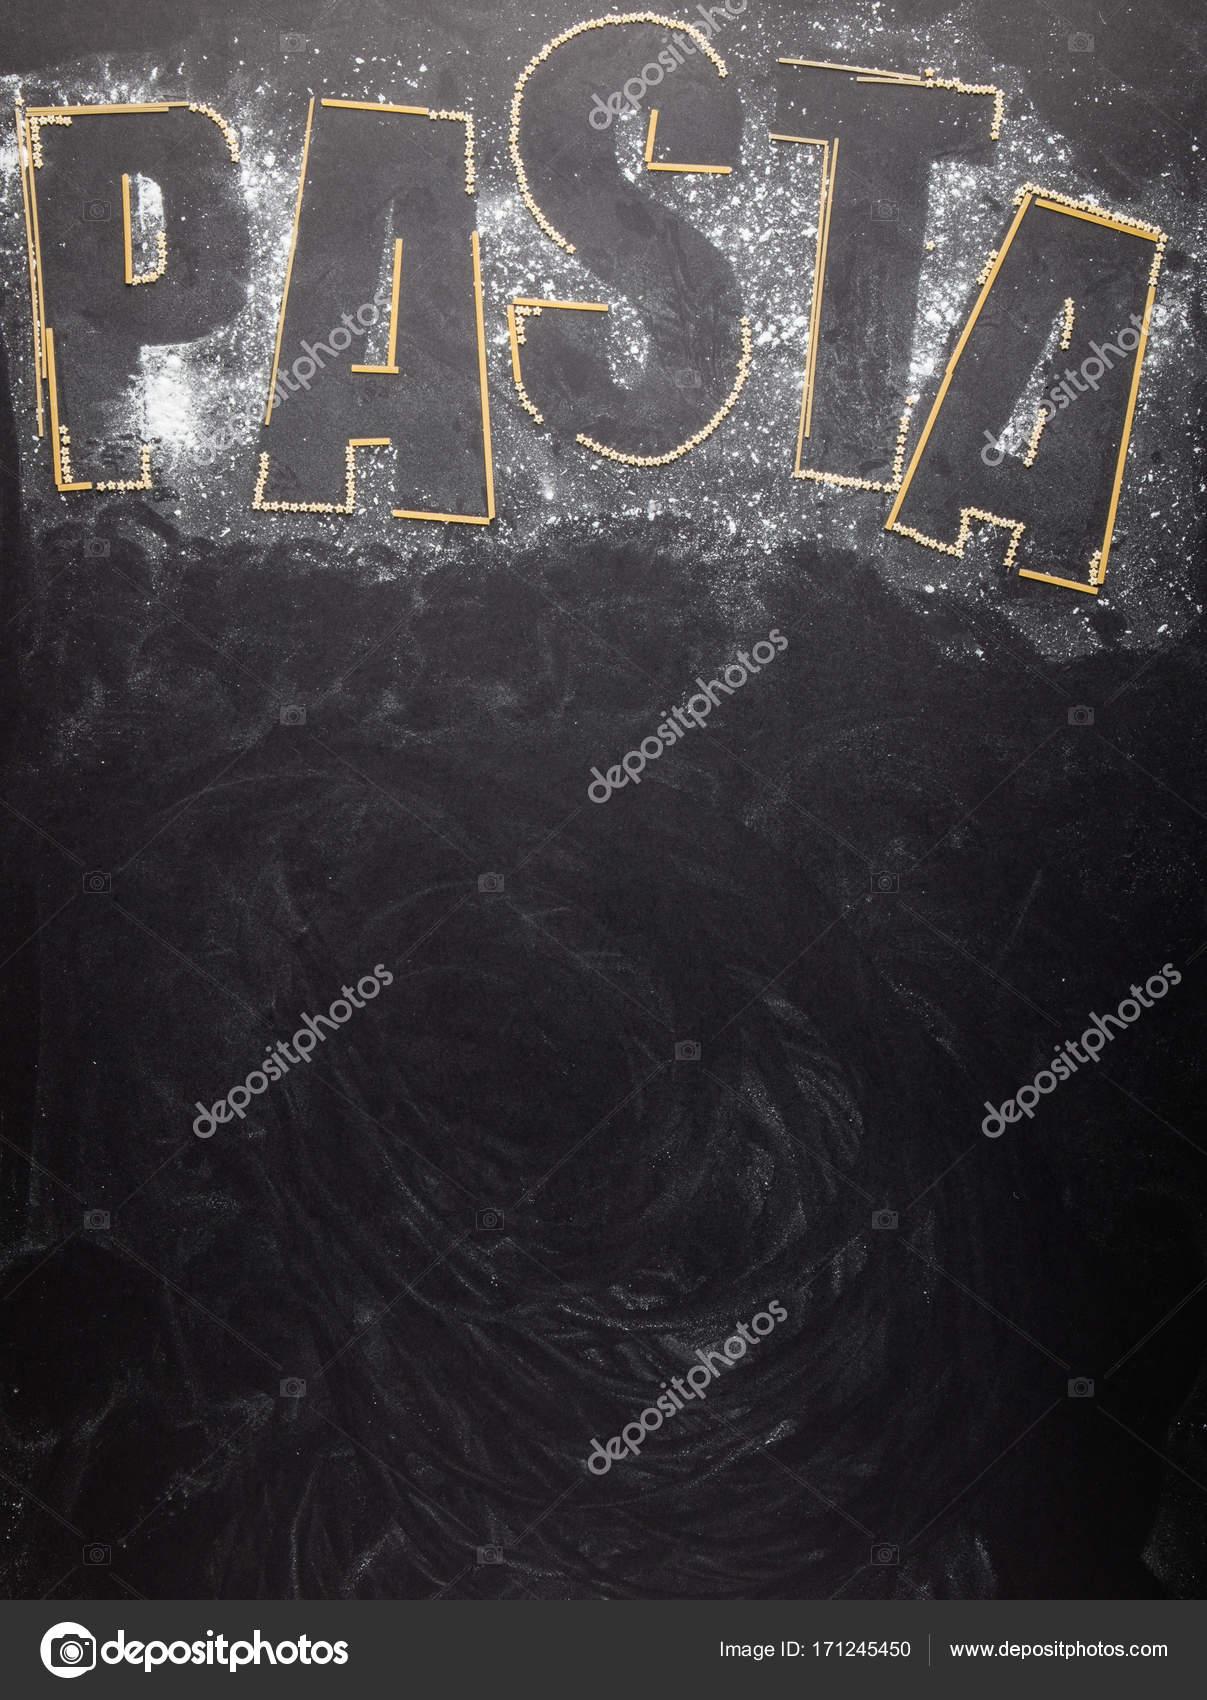 Restaurant menu board design ideas | Restaurant menu design ...